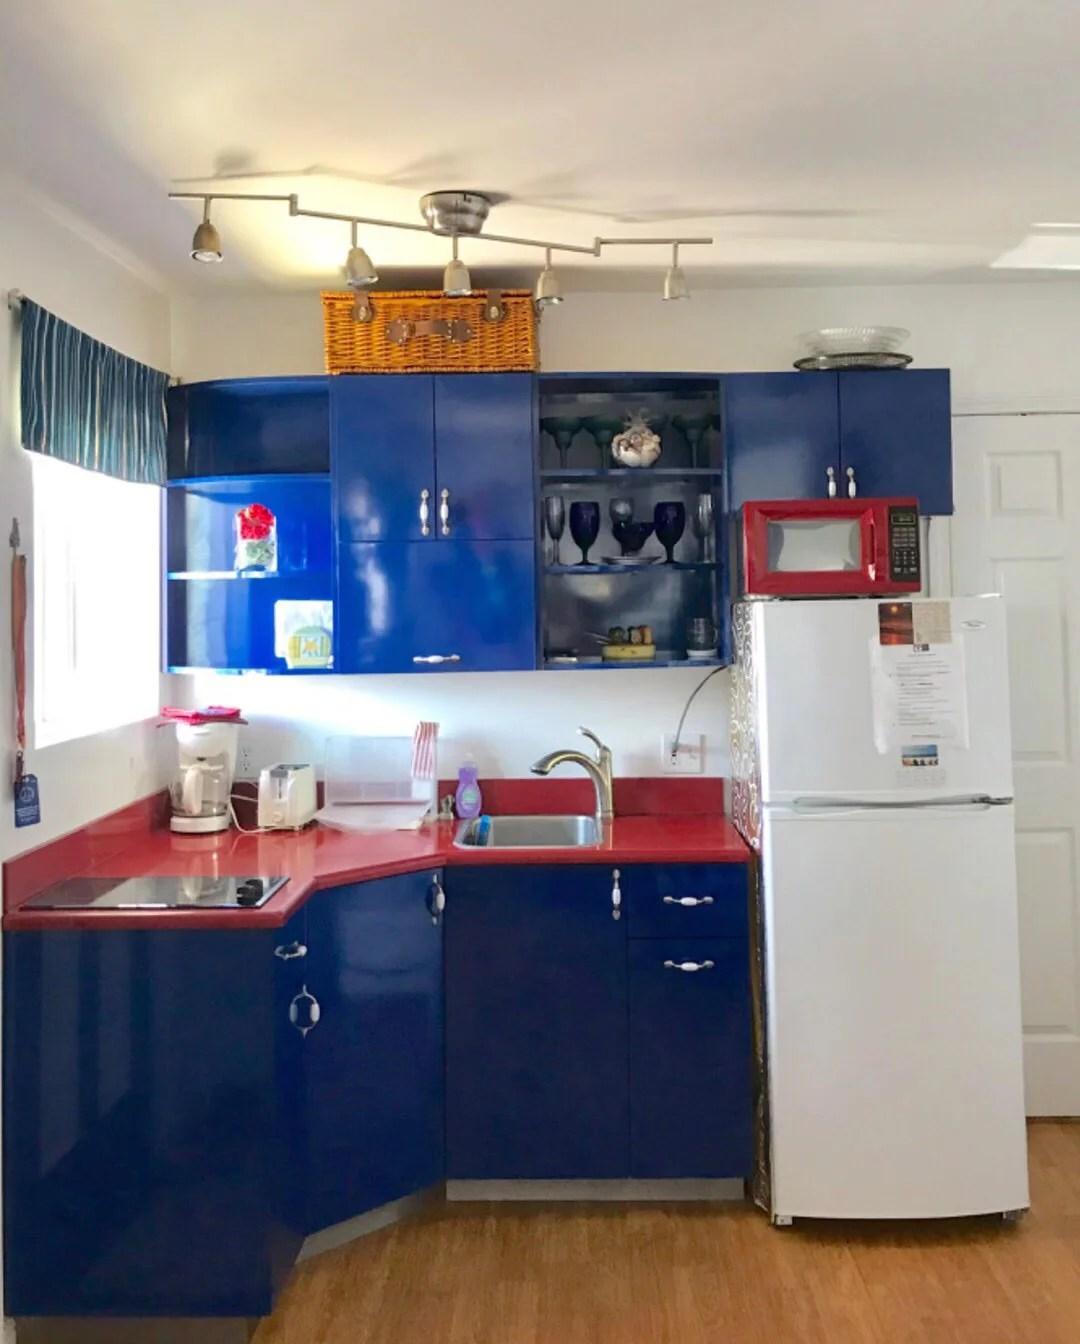 Misquamicut Beach House Rentals : misquamicut, beach, house, rentals, Misquamicut, State, Beach, Vacation, Rentals, Homes, Westerly,, Airbnb